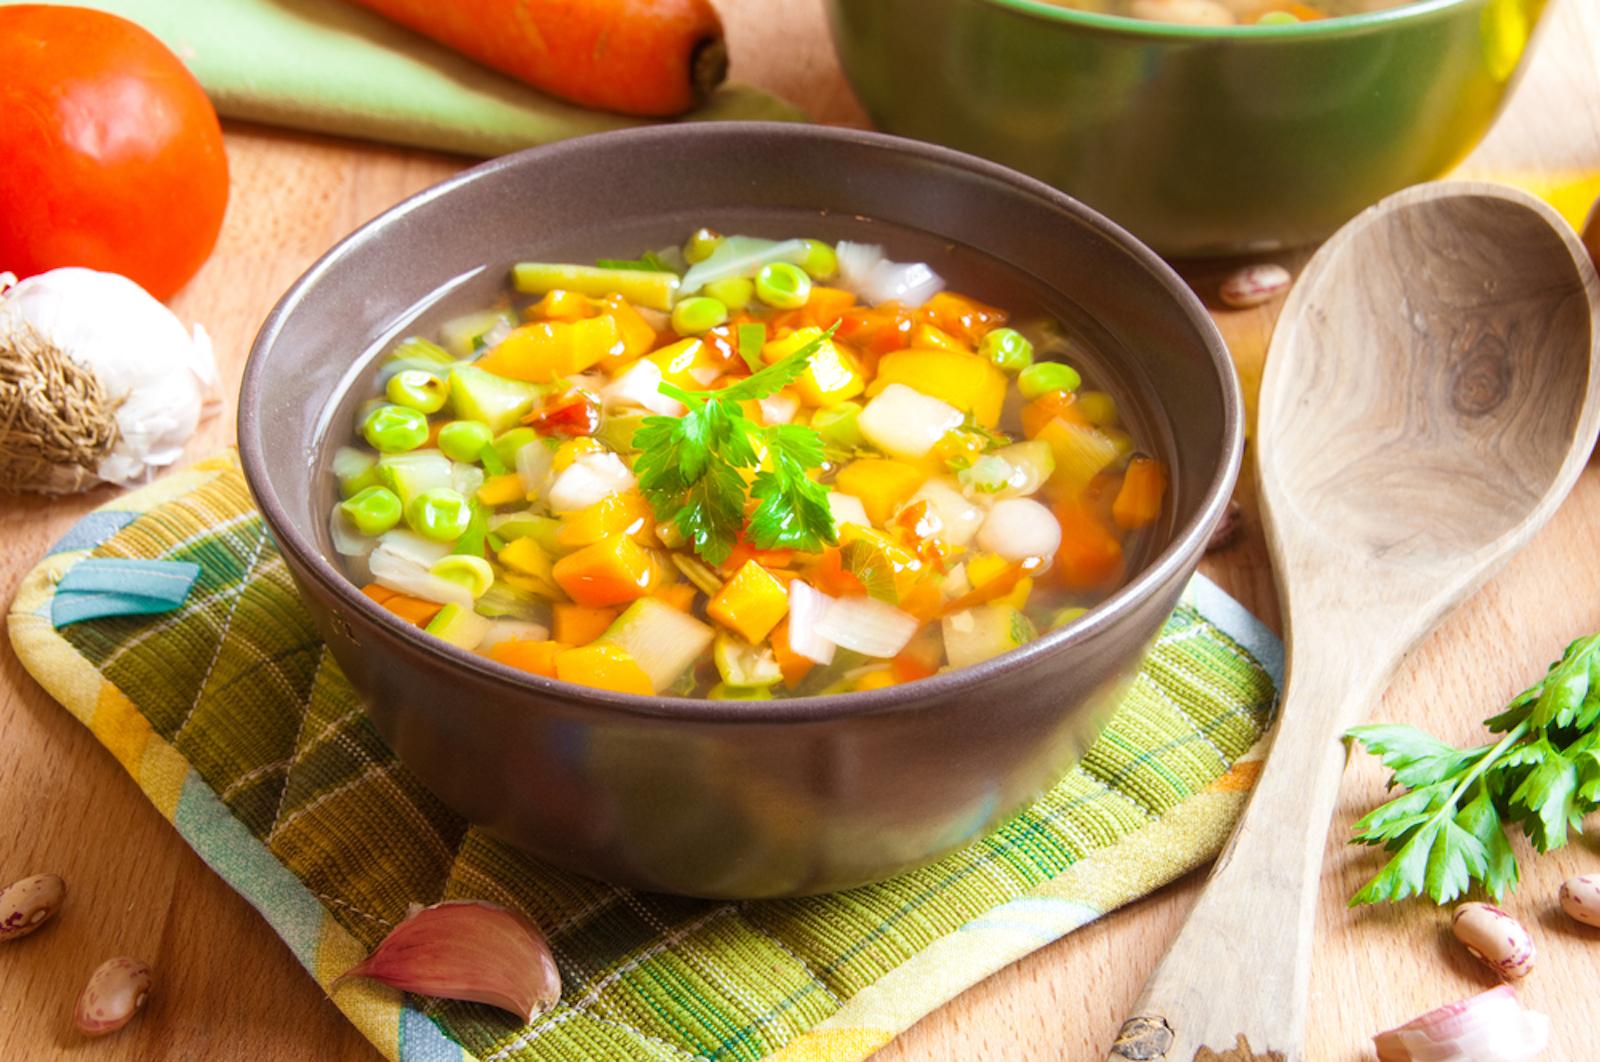 Than useful soup